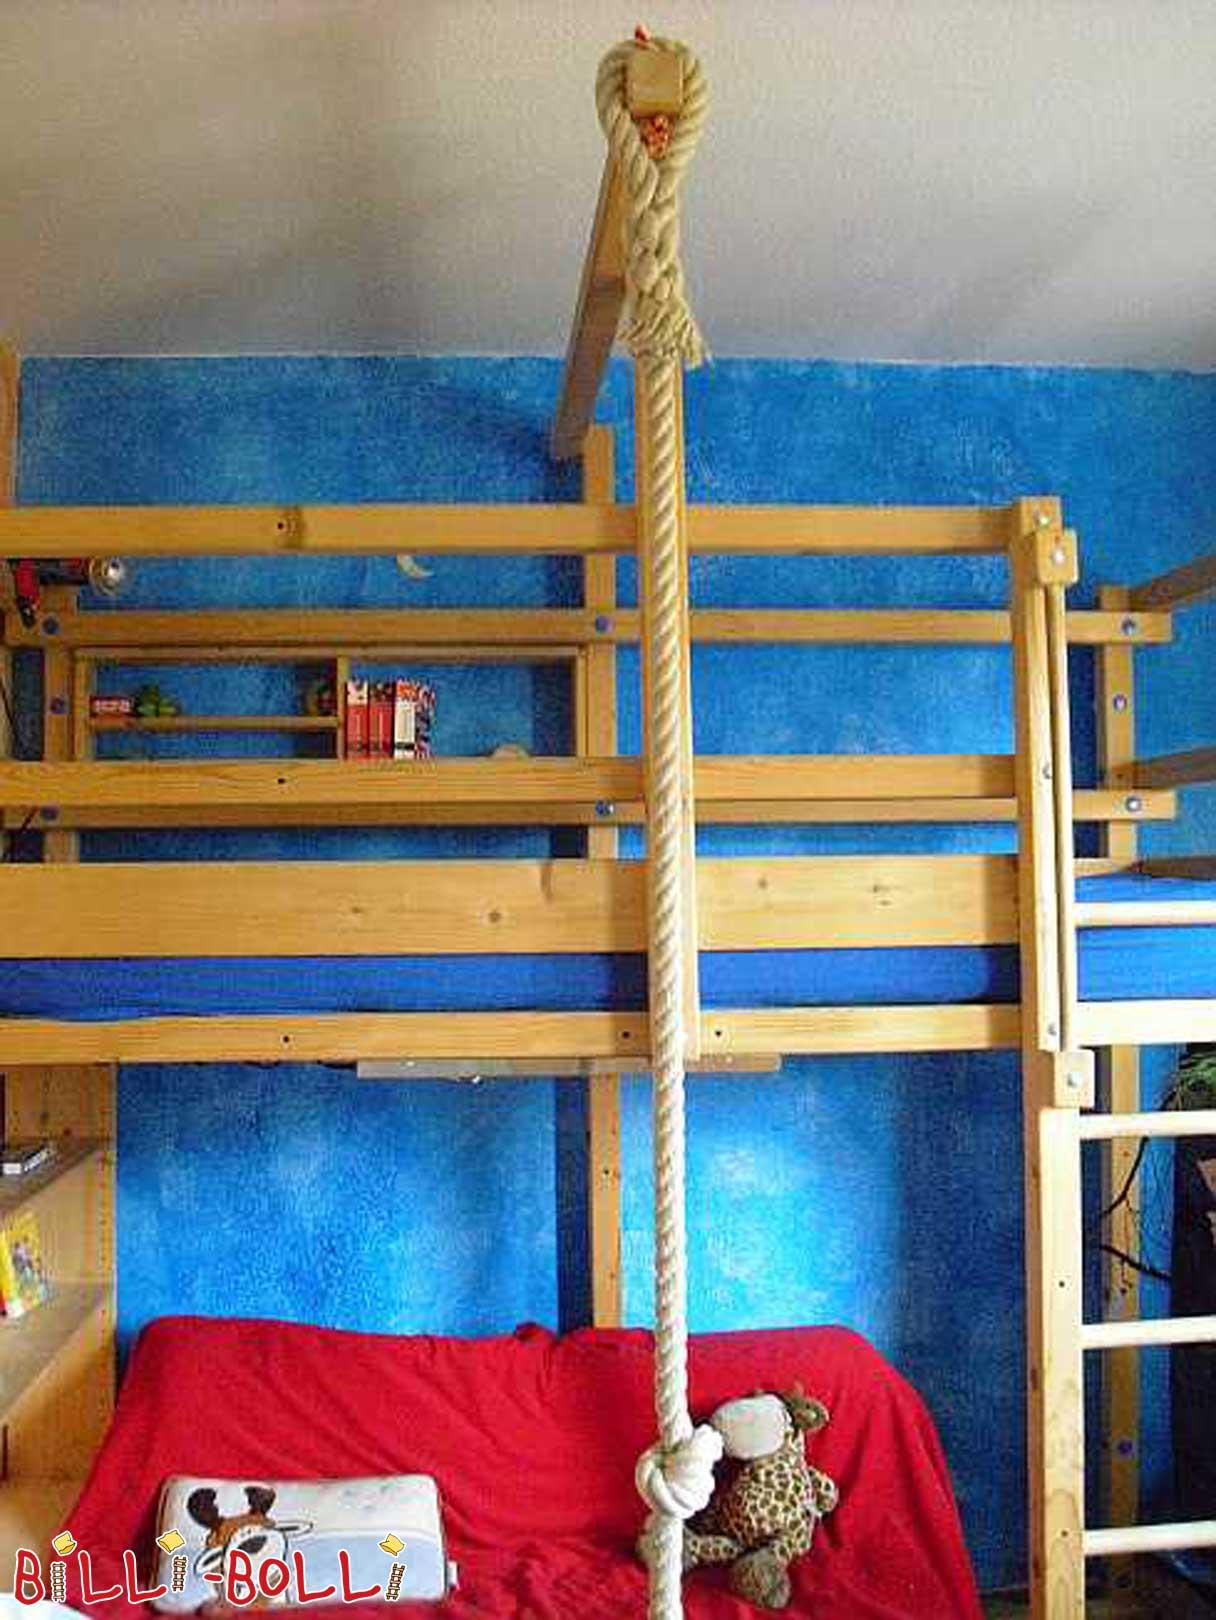 jacoba boxspringbett m bel und heimat design inspiration. Black Bedroom Furniture Sets. Home Design Ideas